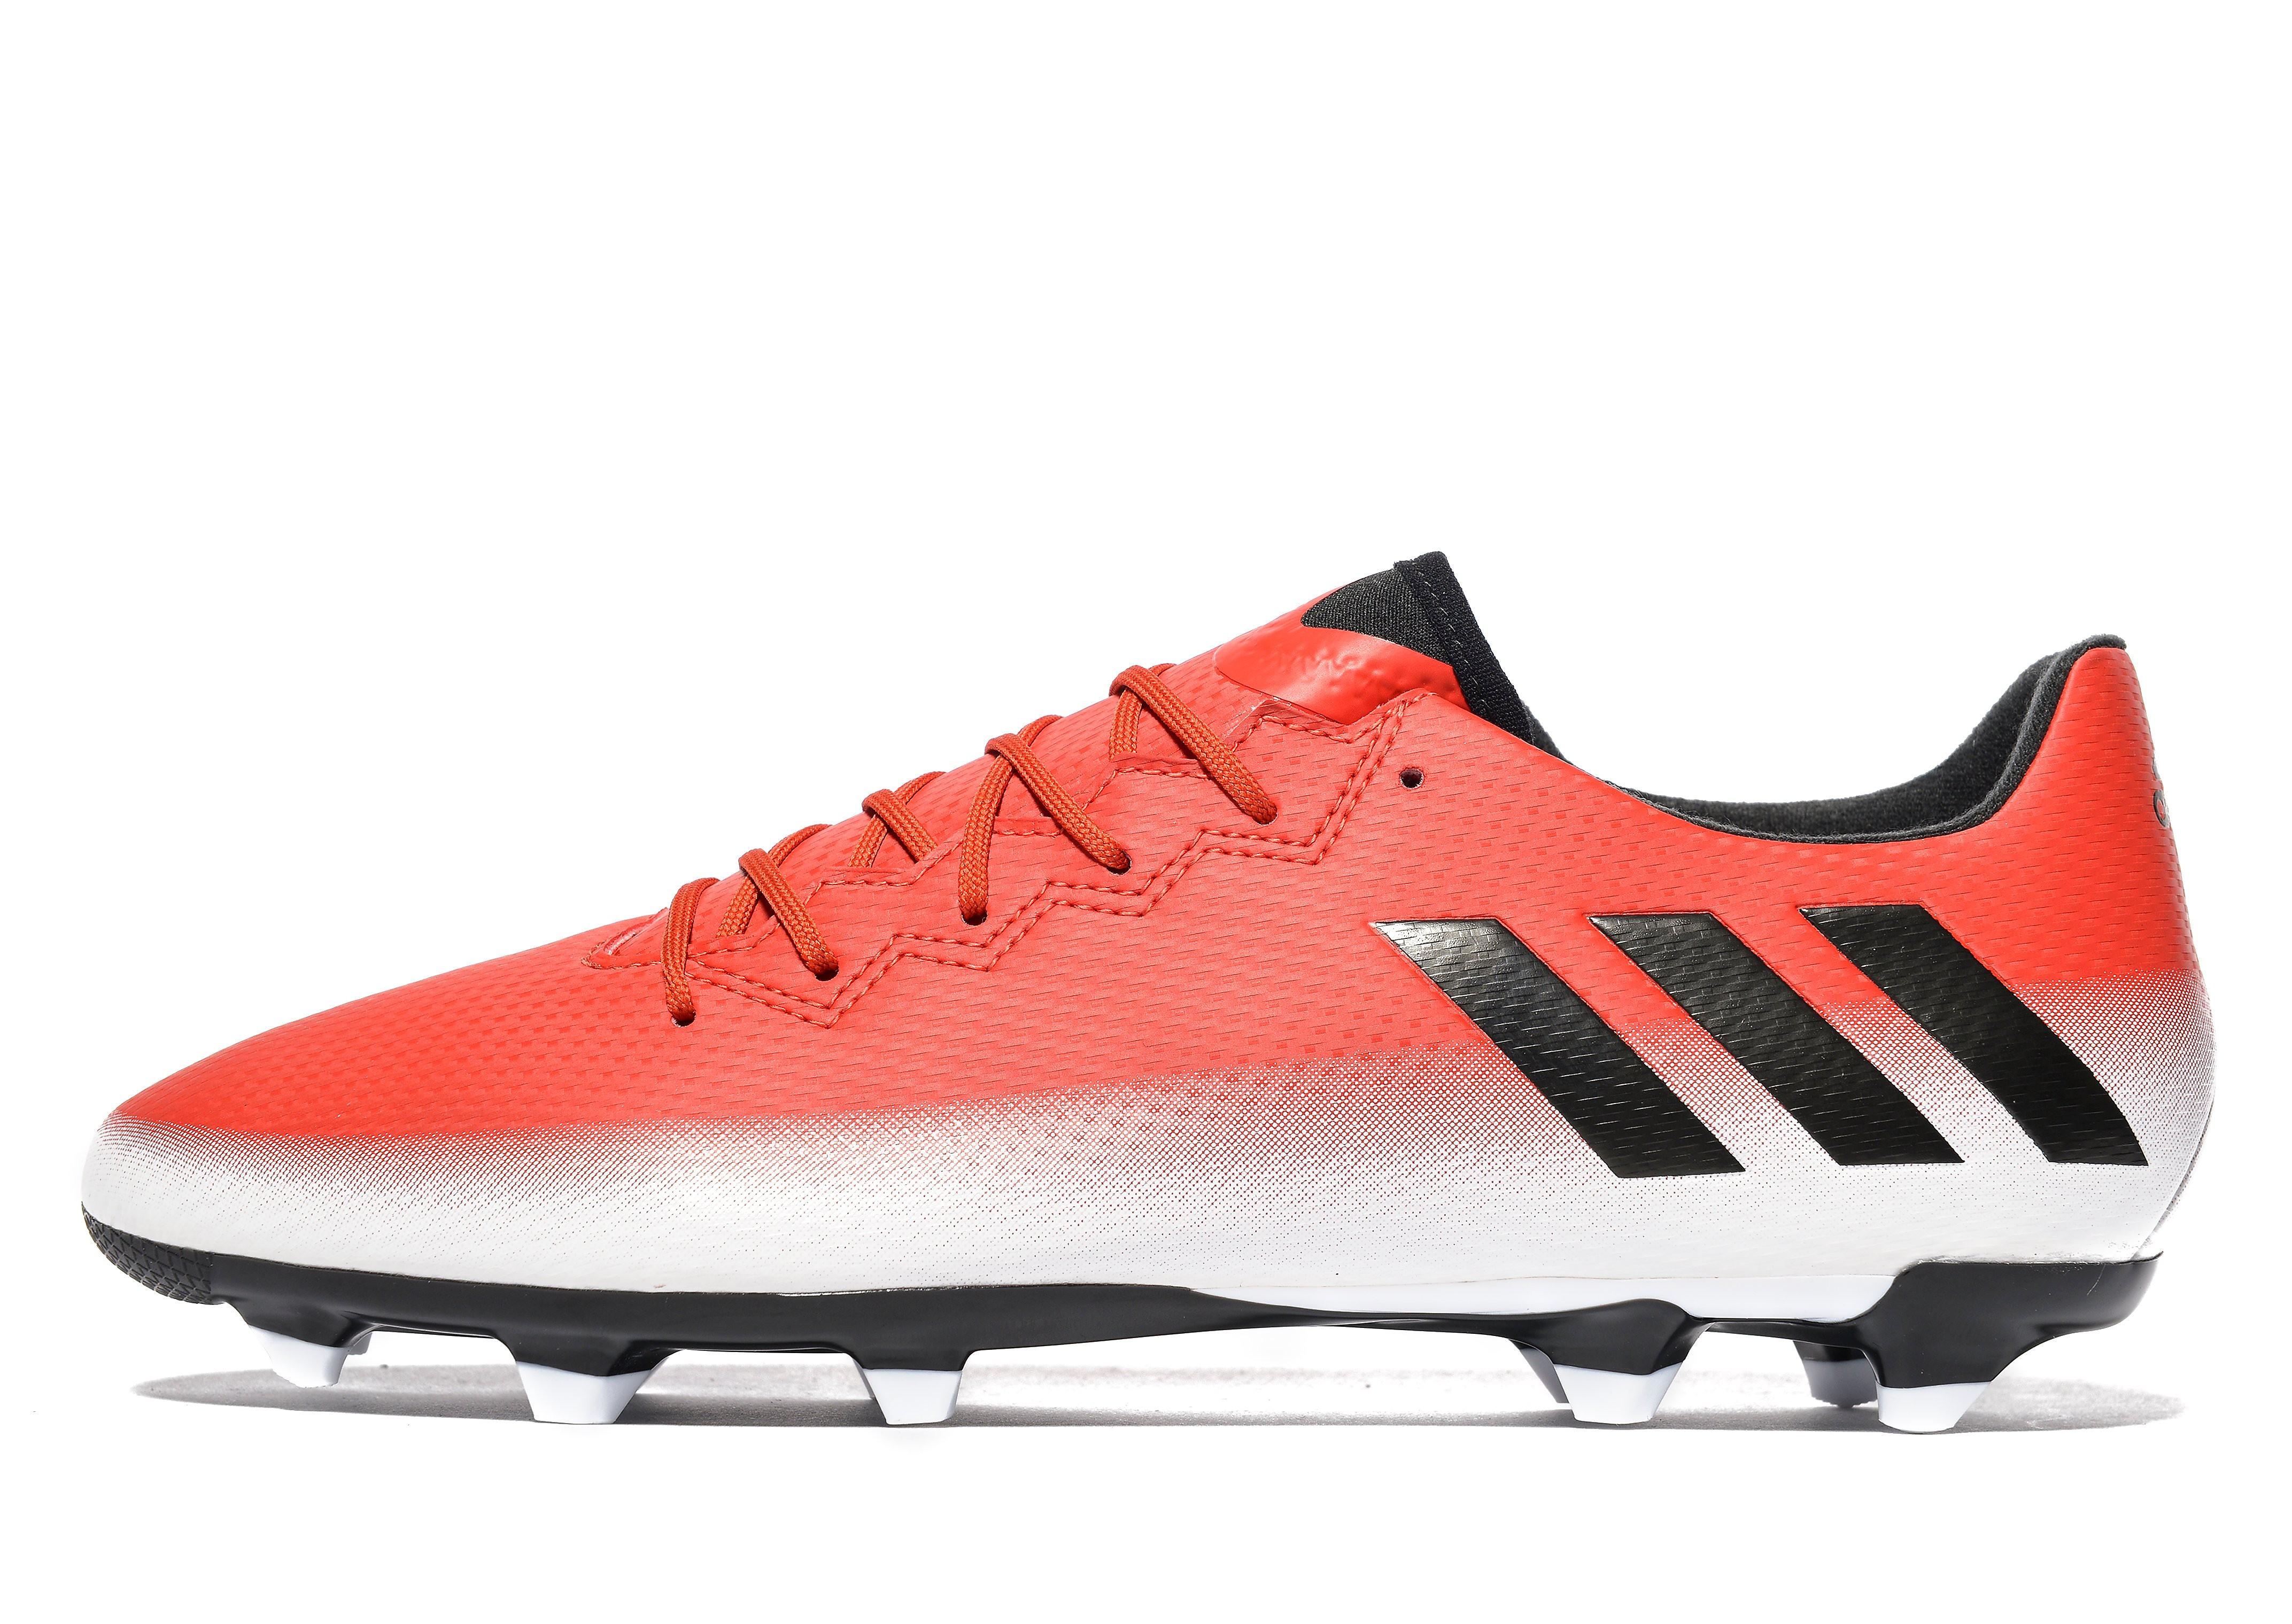 adidas Red Limit Messi 16.3 FG